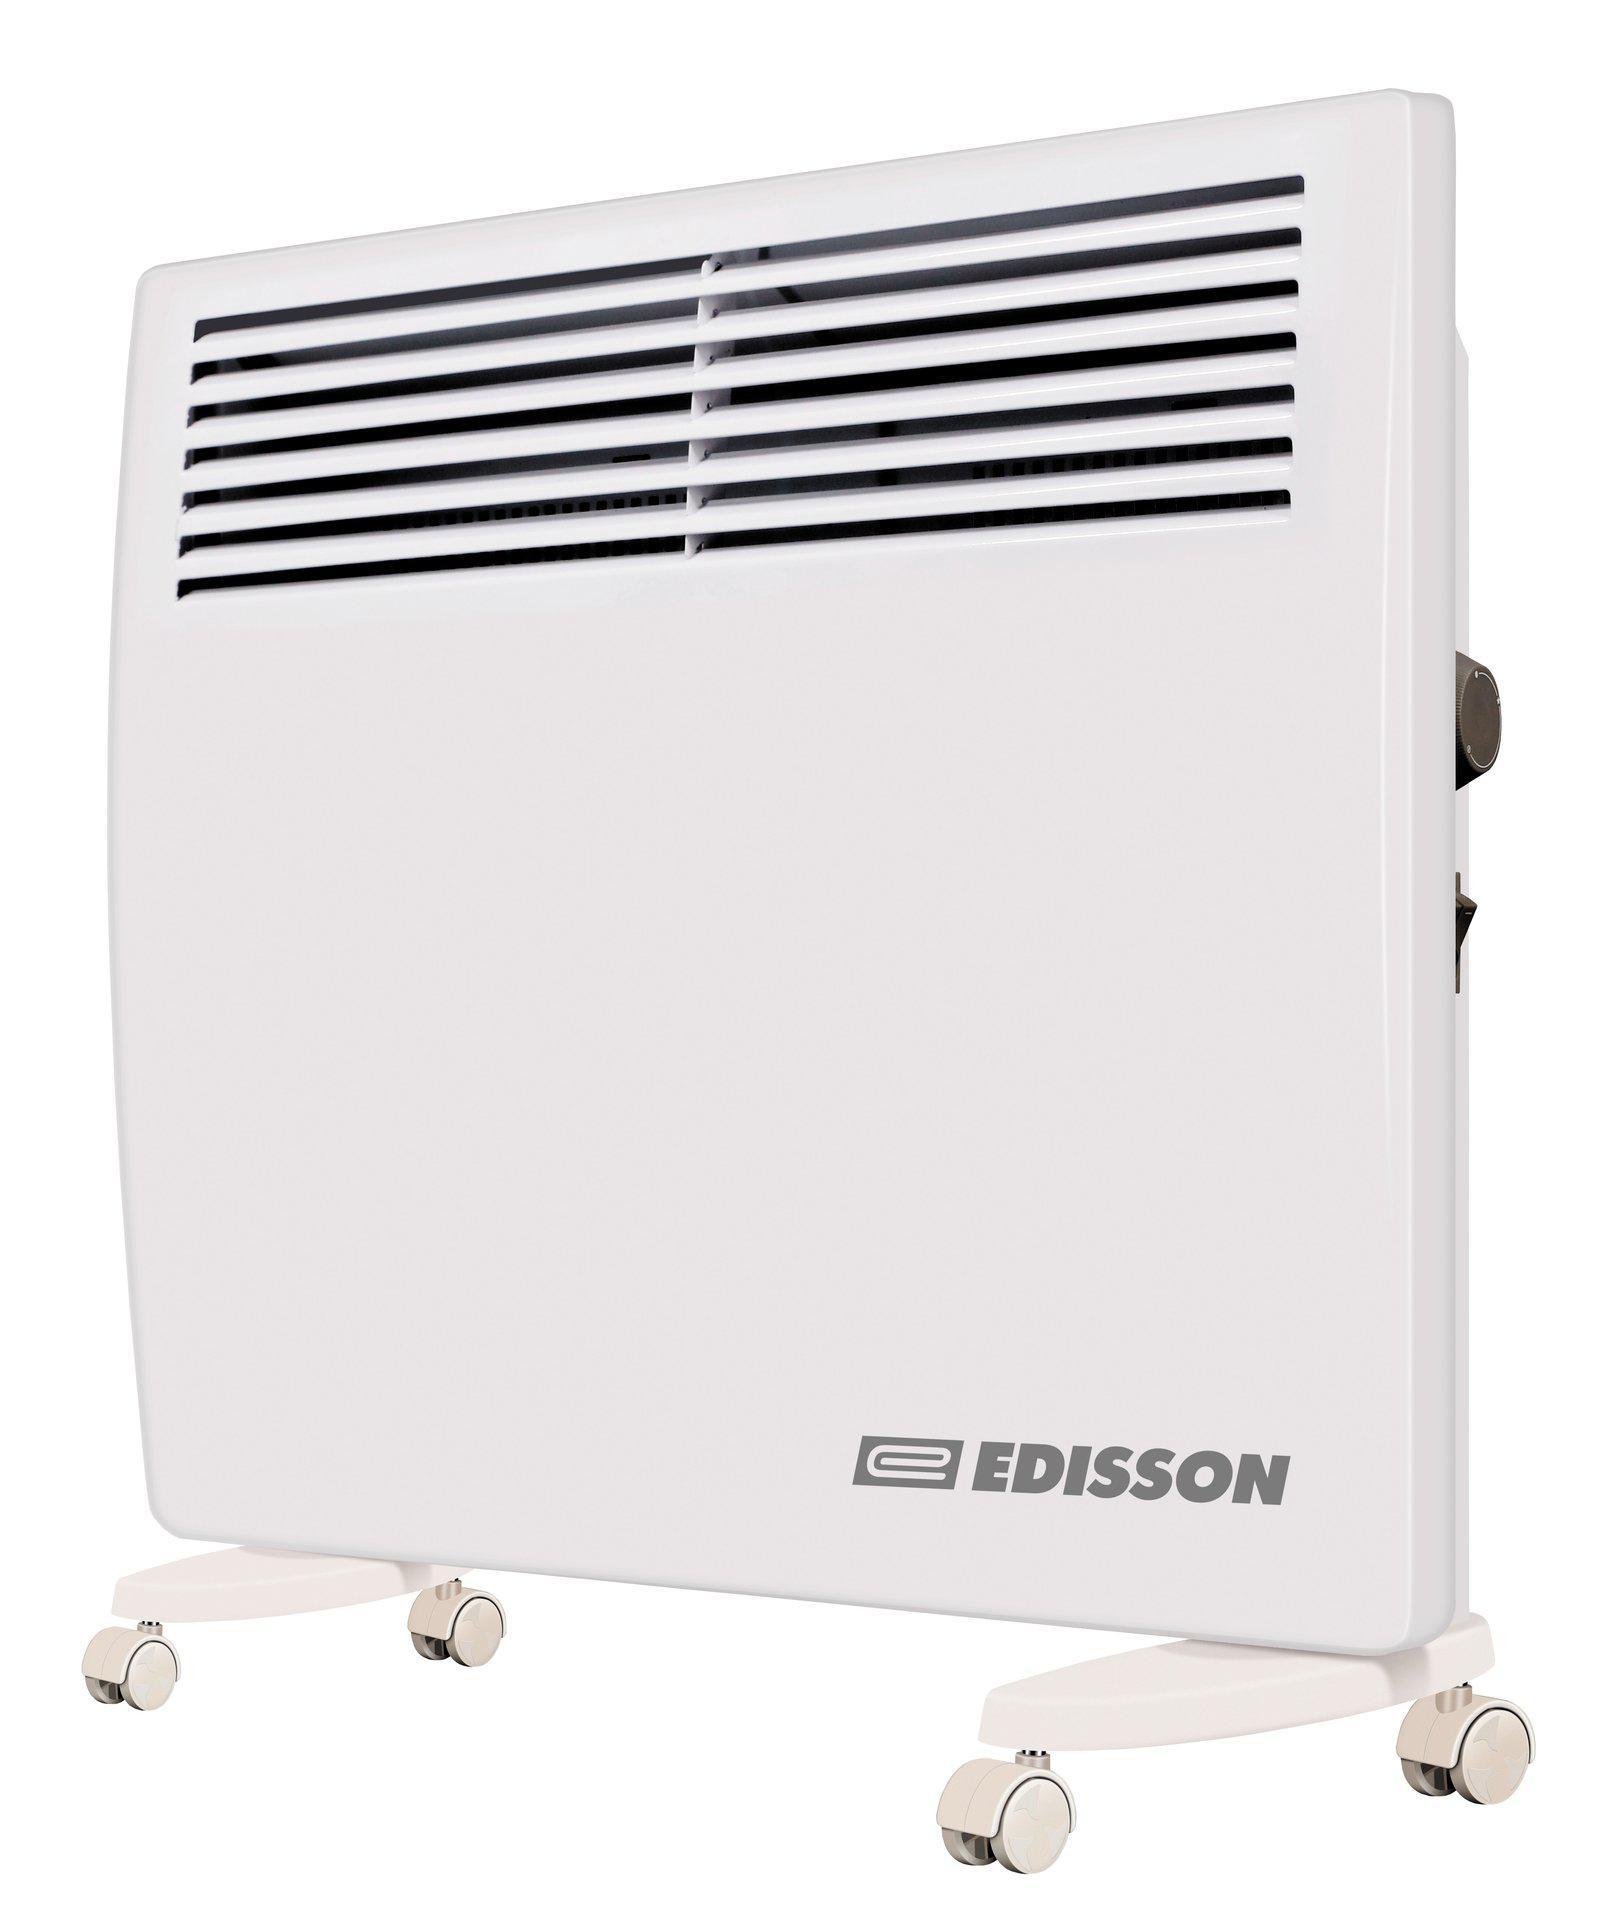 Конвектор Edisson S2000ub